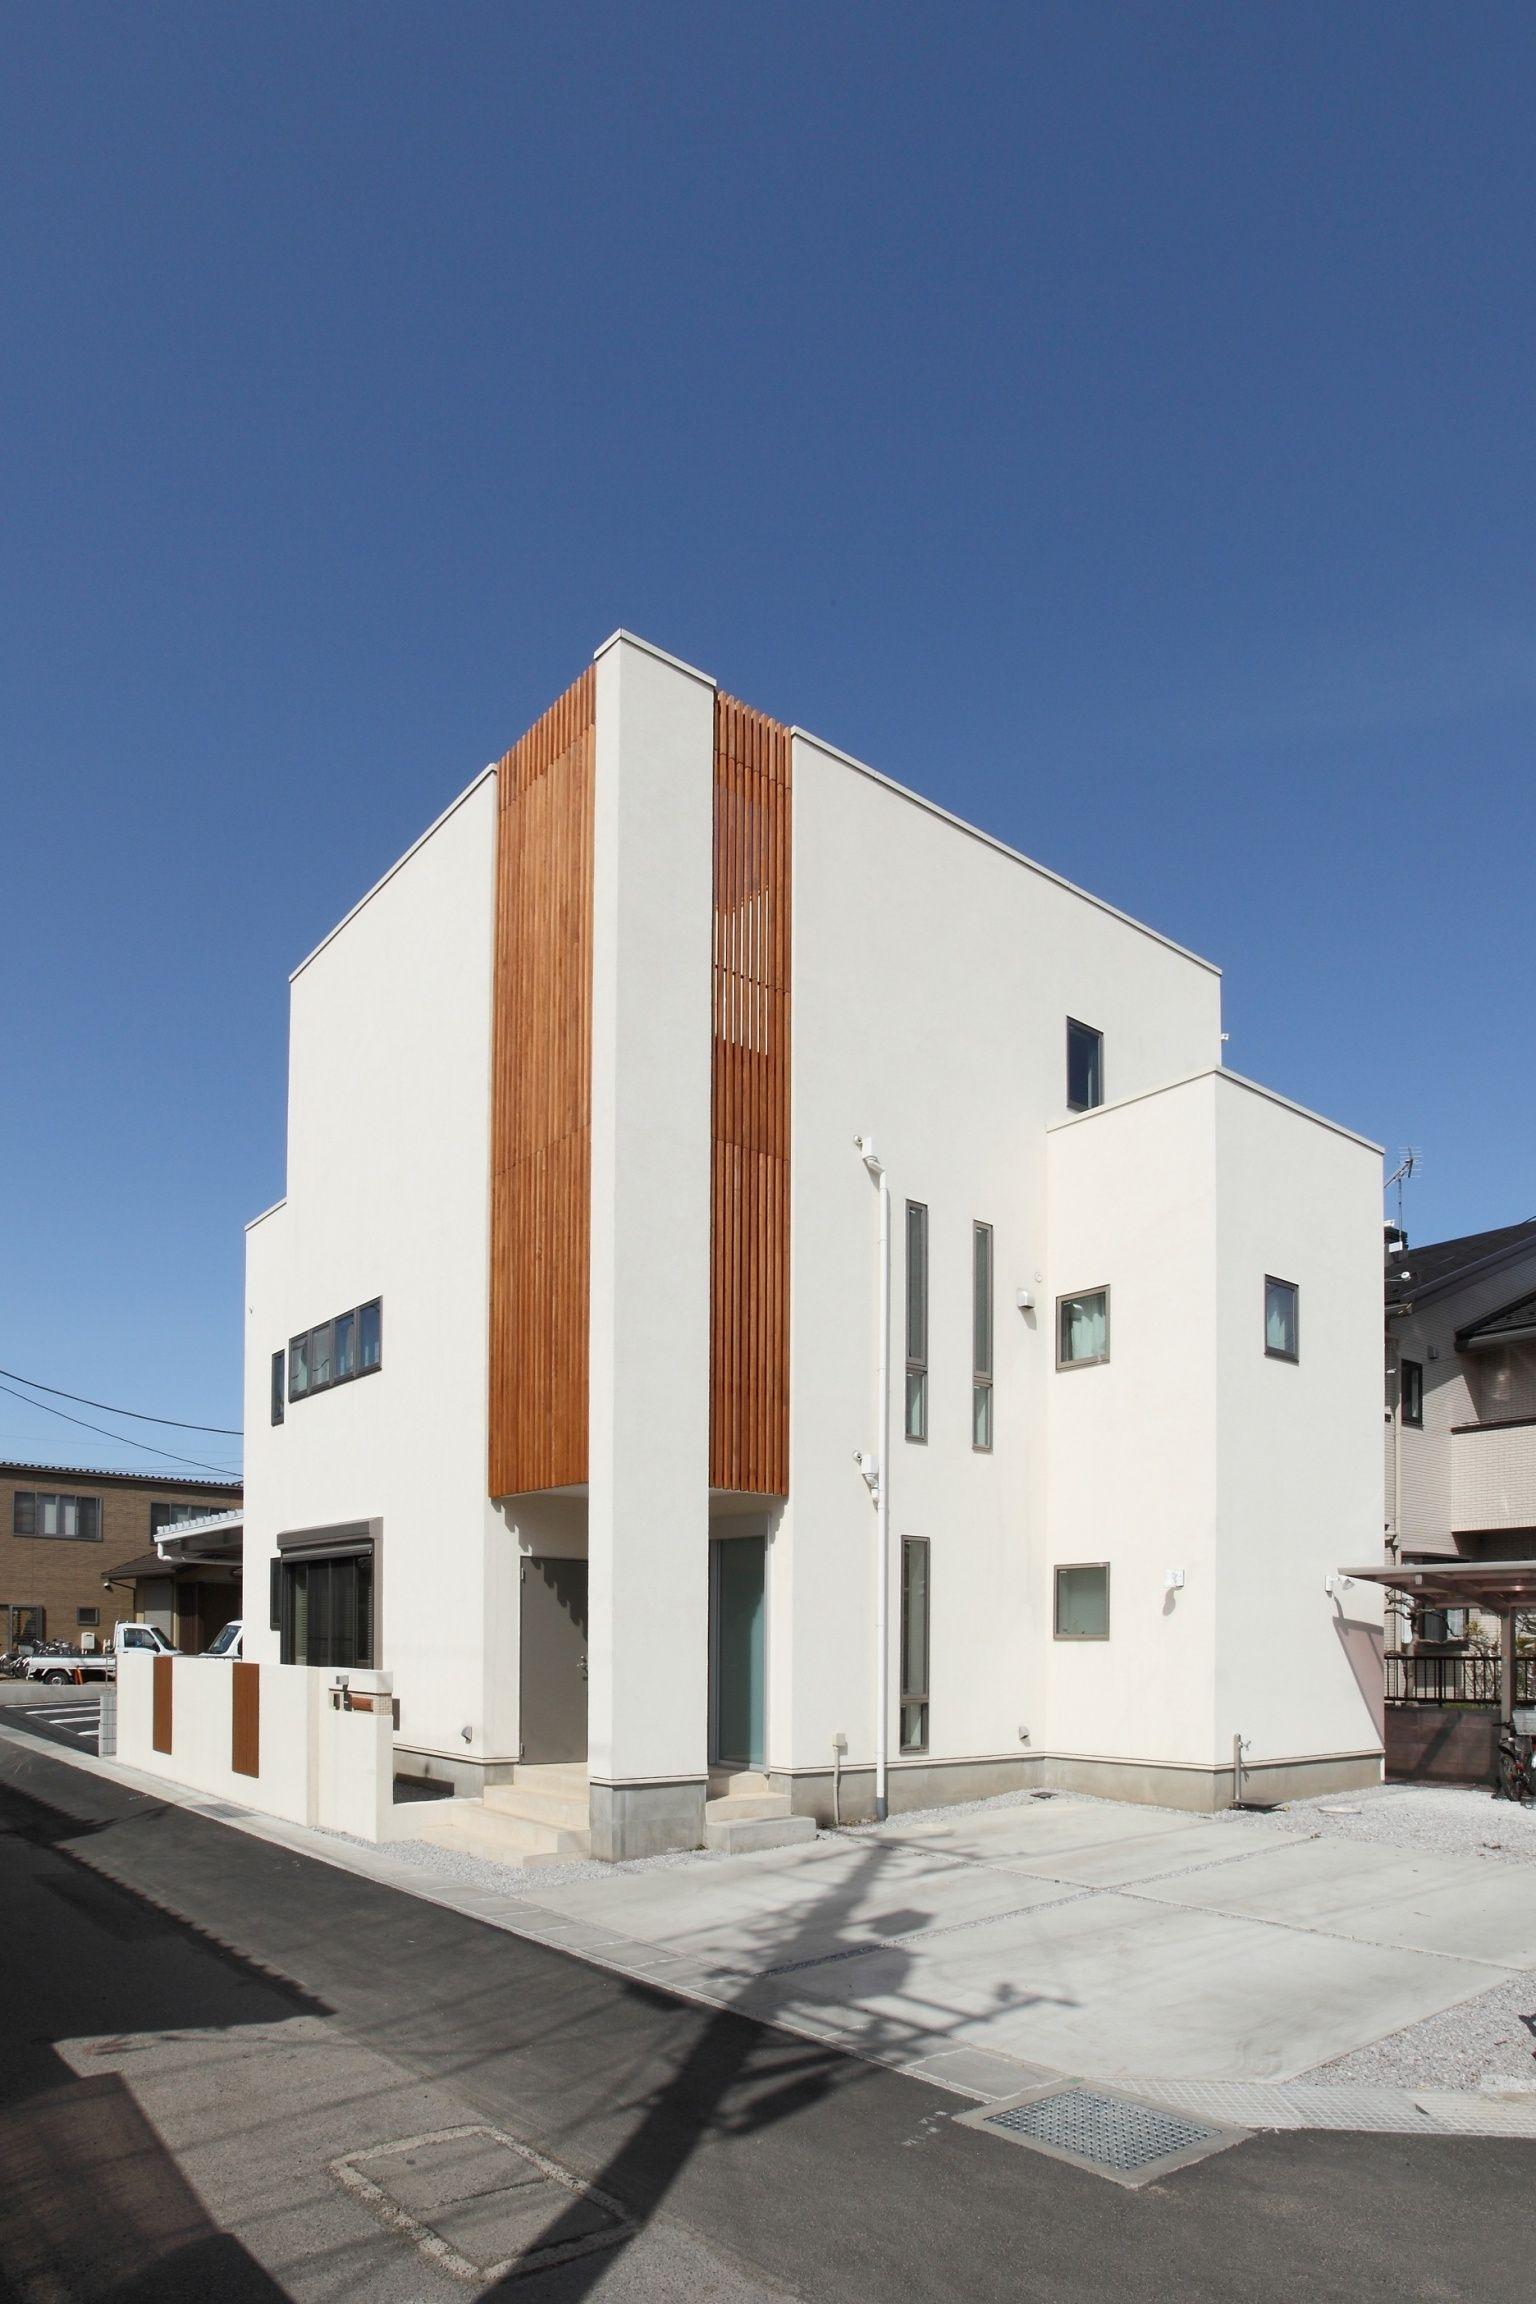 Se構法 3階建2世帯ハウス 木製ルーバーがアクセントの二世帯3階建て住宅 重量木骨の家 選ばれた工務店と建てる木造注文